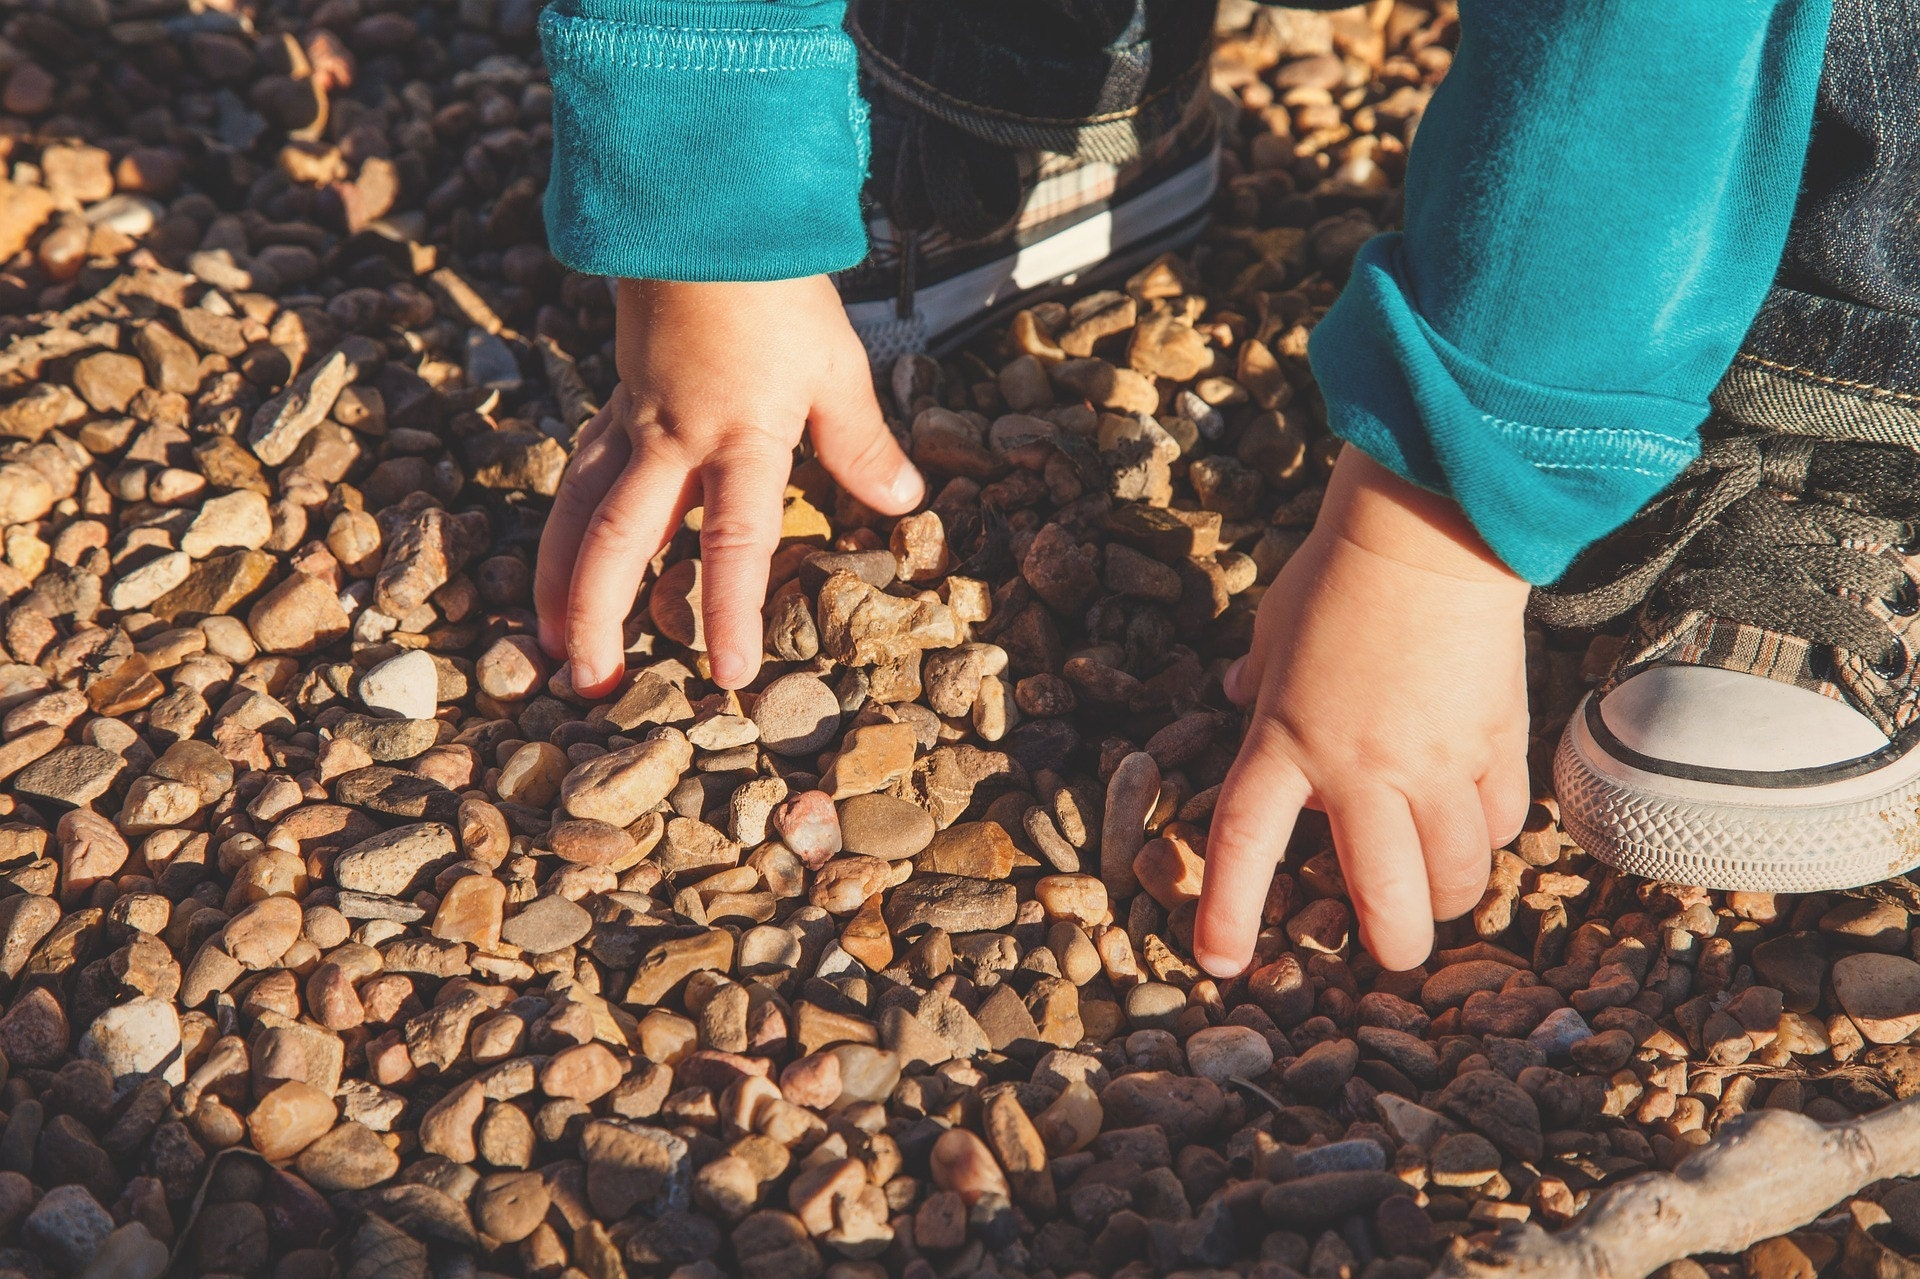 Outdoor play, pebbles, child, explore, sensory